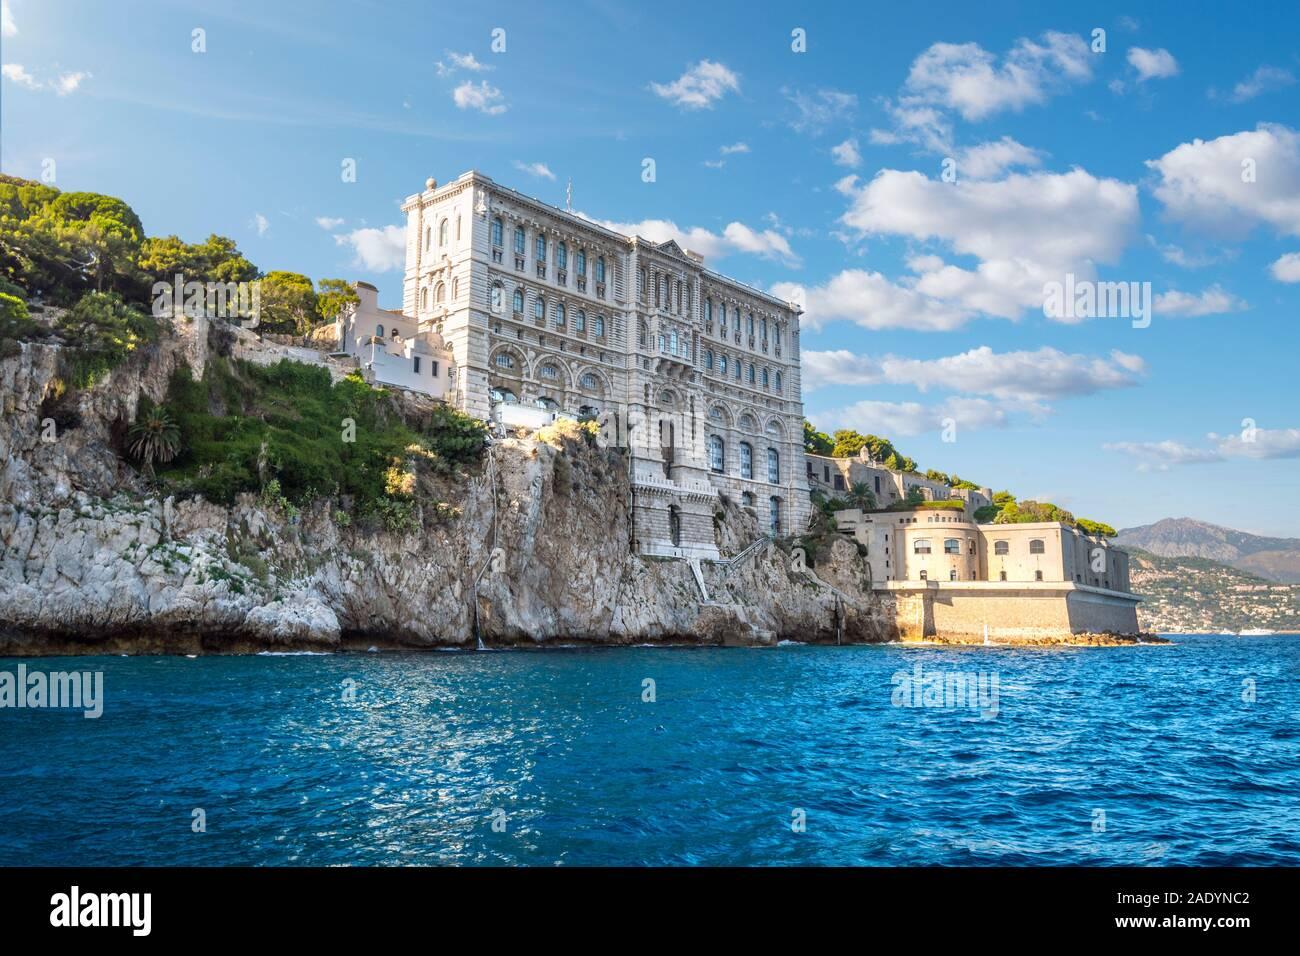 View from the sea of the Monaco Aquarium Oceanographic Museum of marine sciences in Monaco-Ville, Monaco. Stock Photo